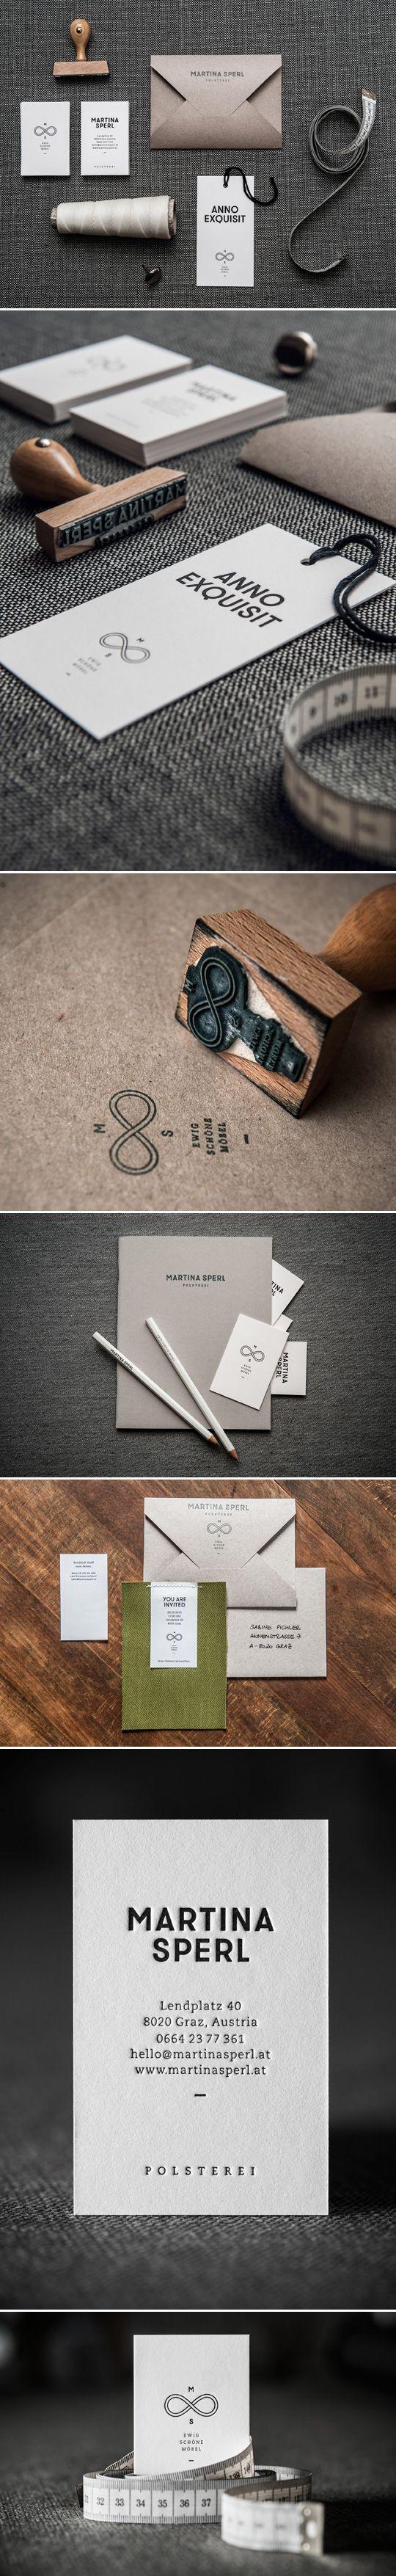 20 Inspiring Stationery Designs / print finish on ww.tobydesigns.com